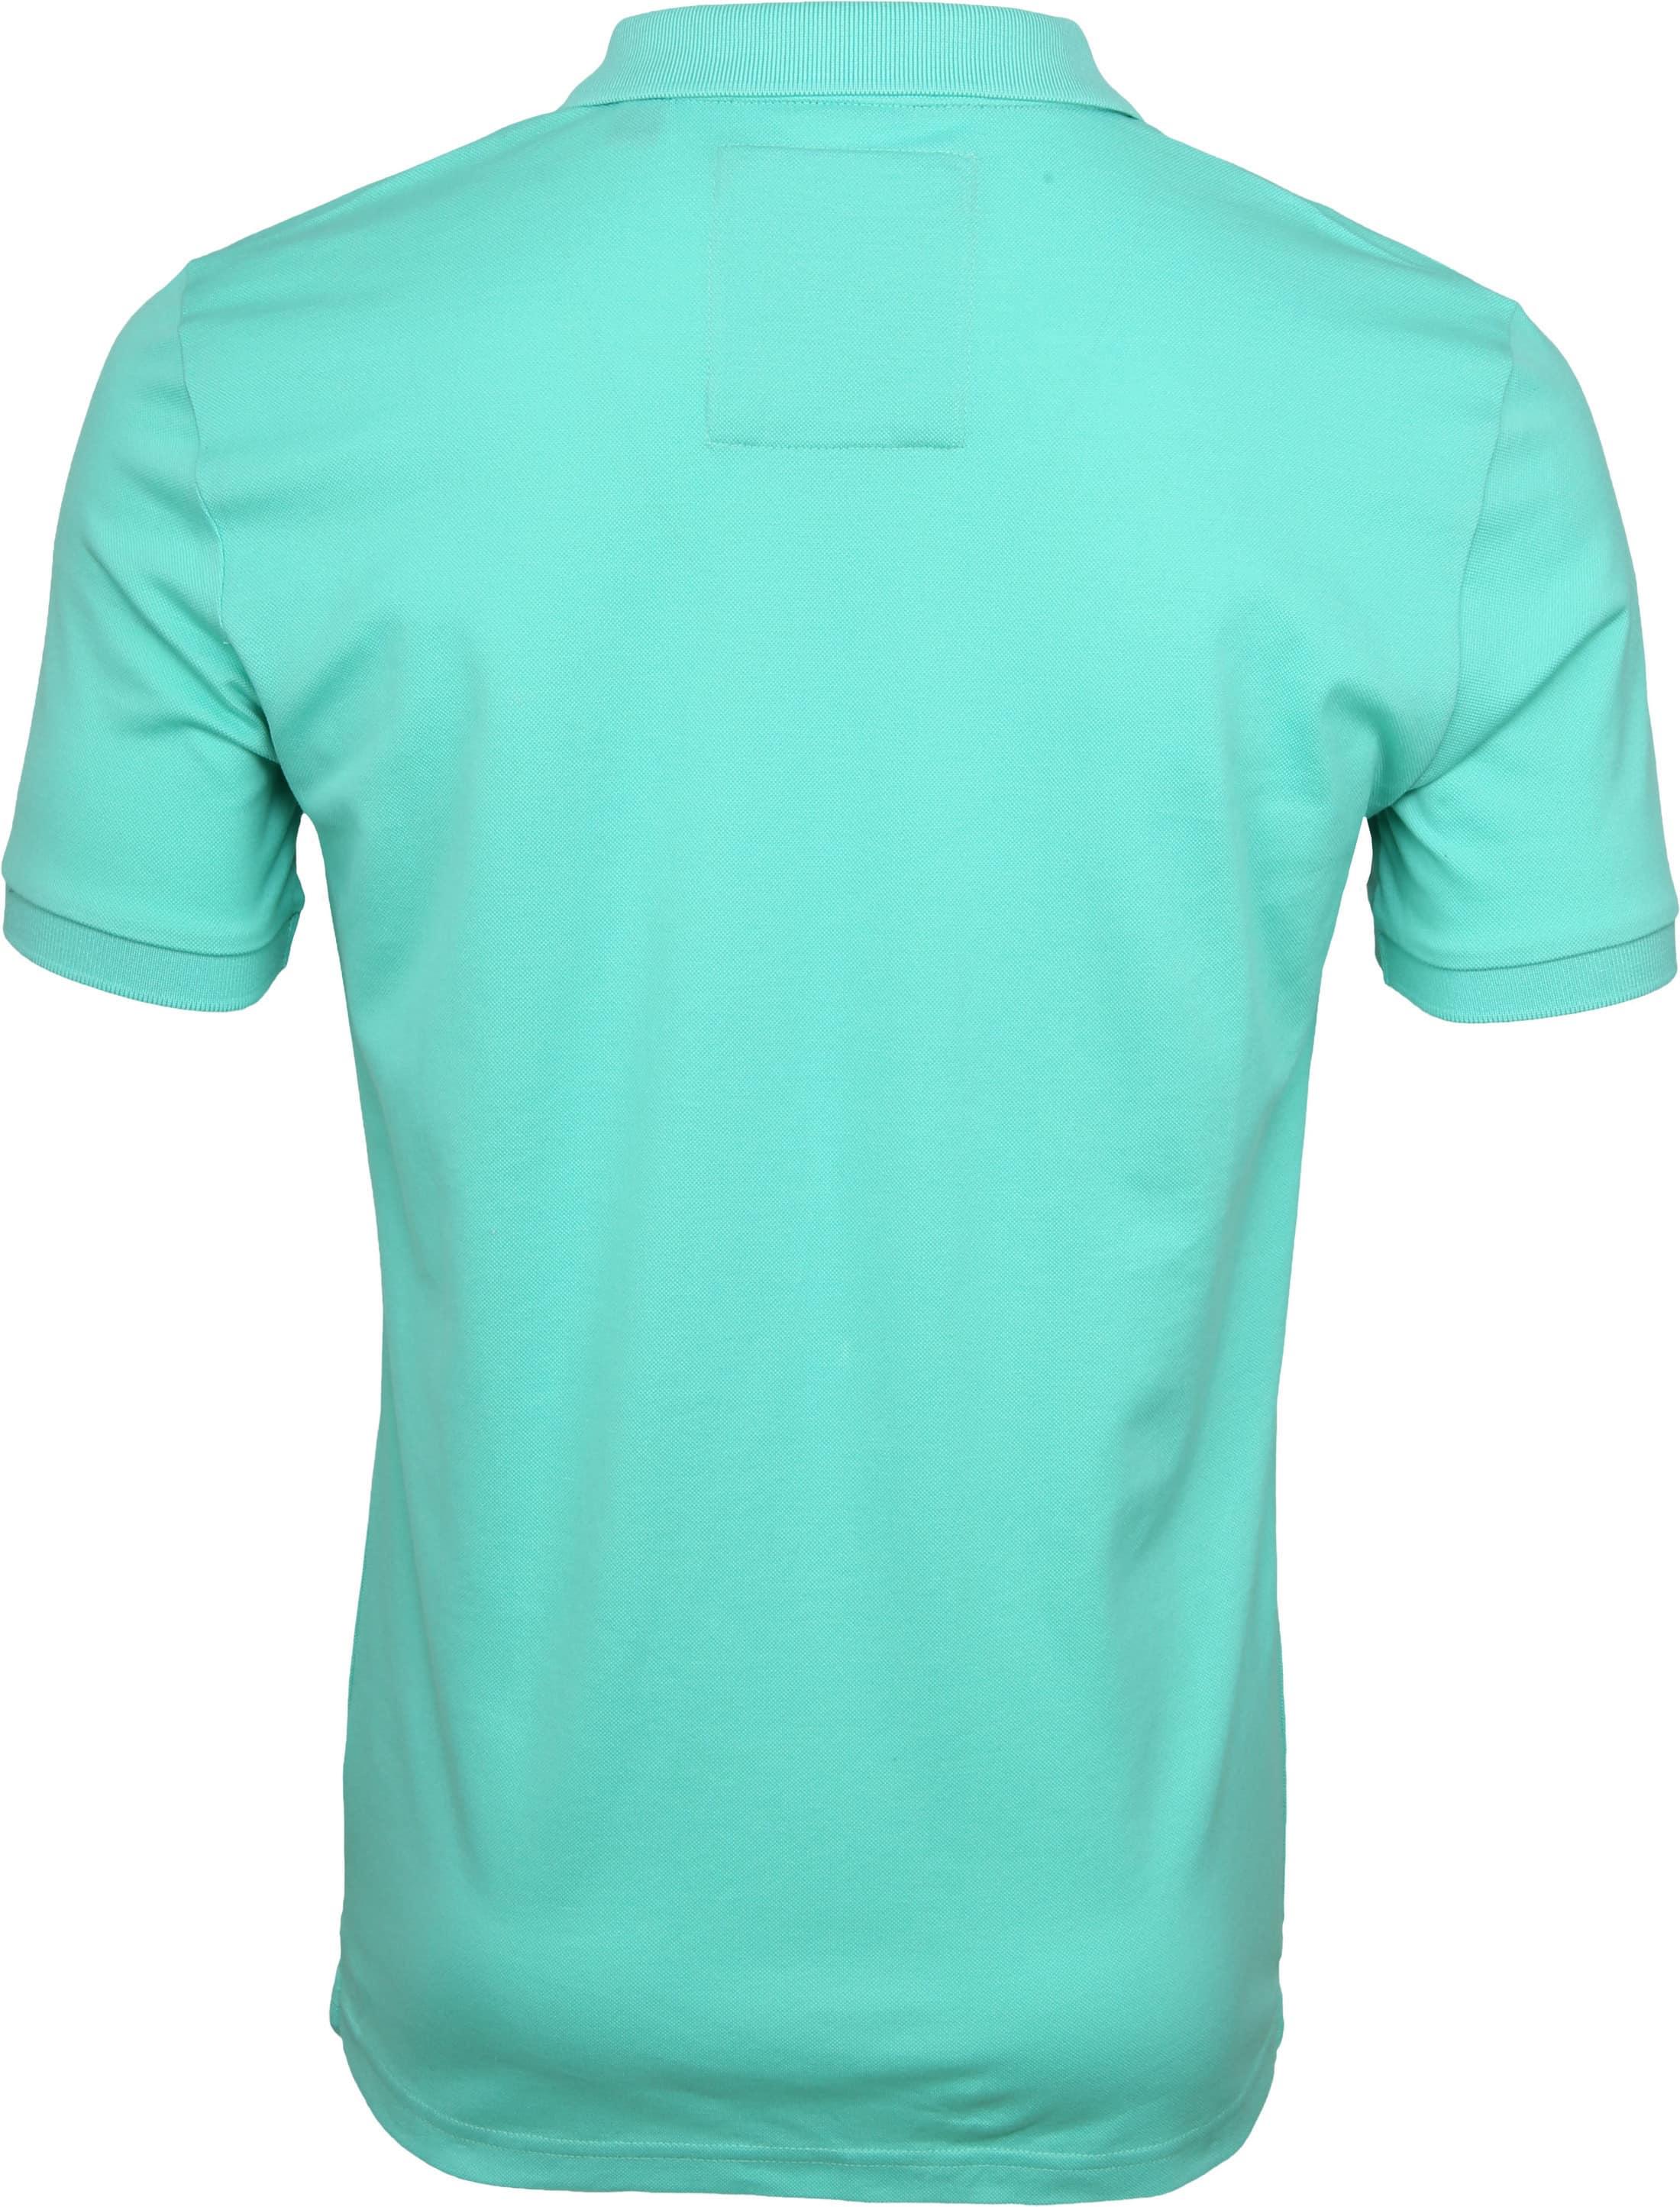 Superdry Poloshirt Premium Turquoise foto 3